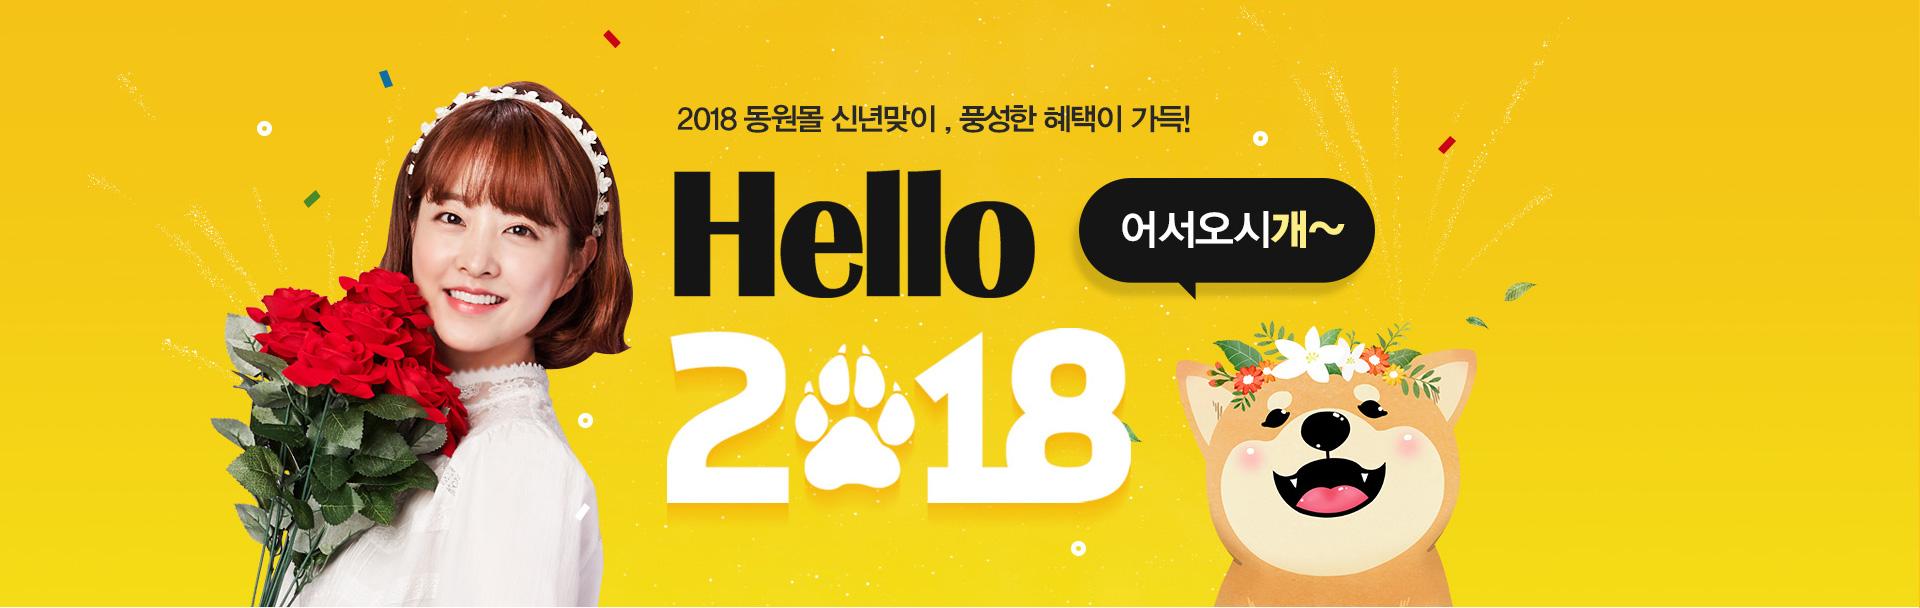 Hello 2018 2018년 동원몰 신년맞이, 풍성한 혜택가득!